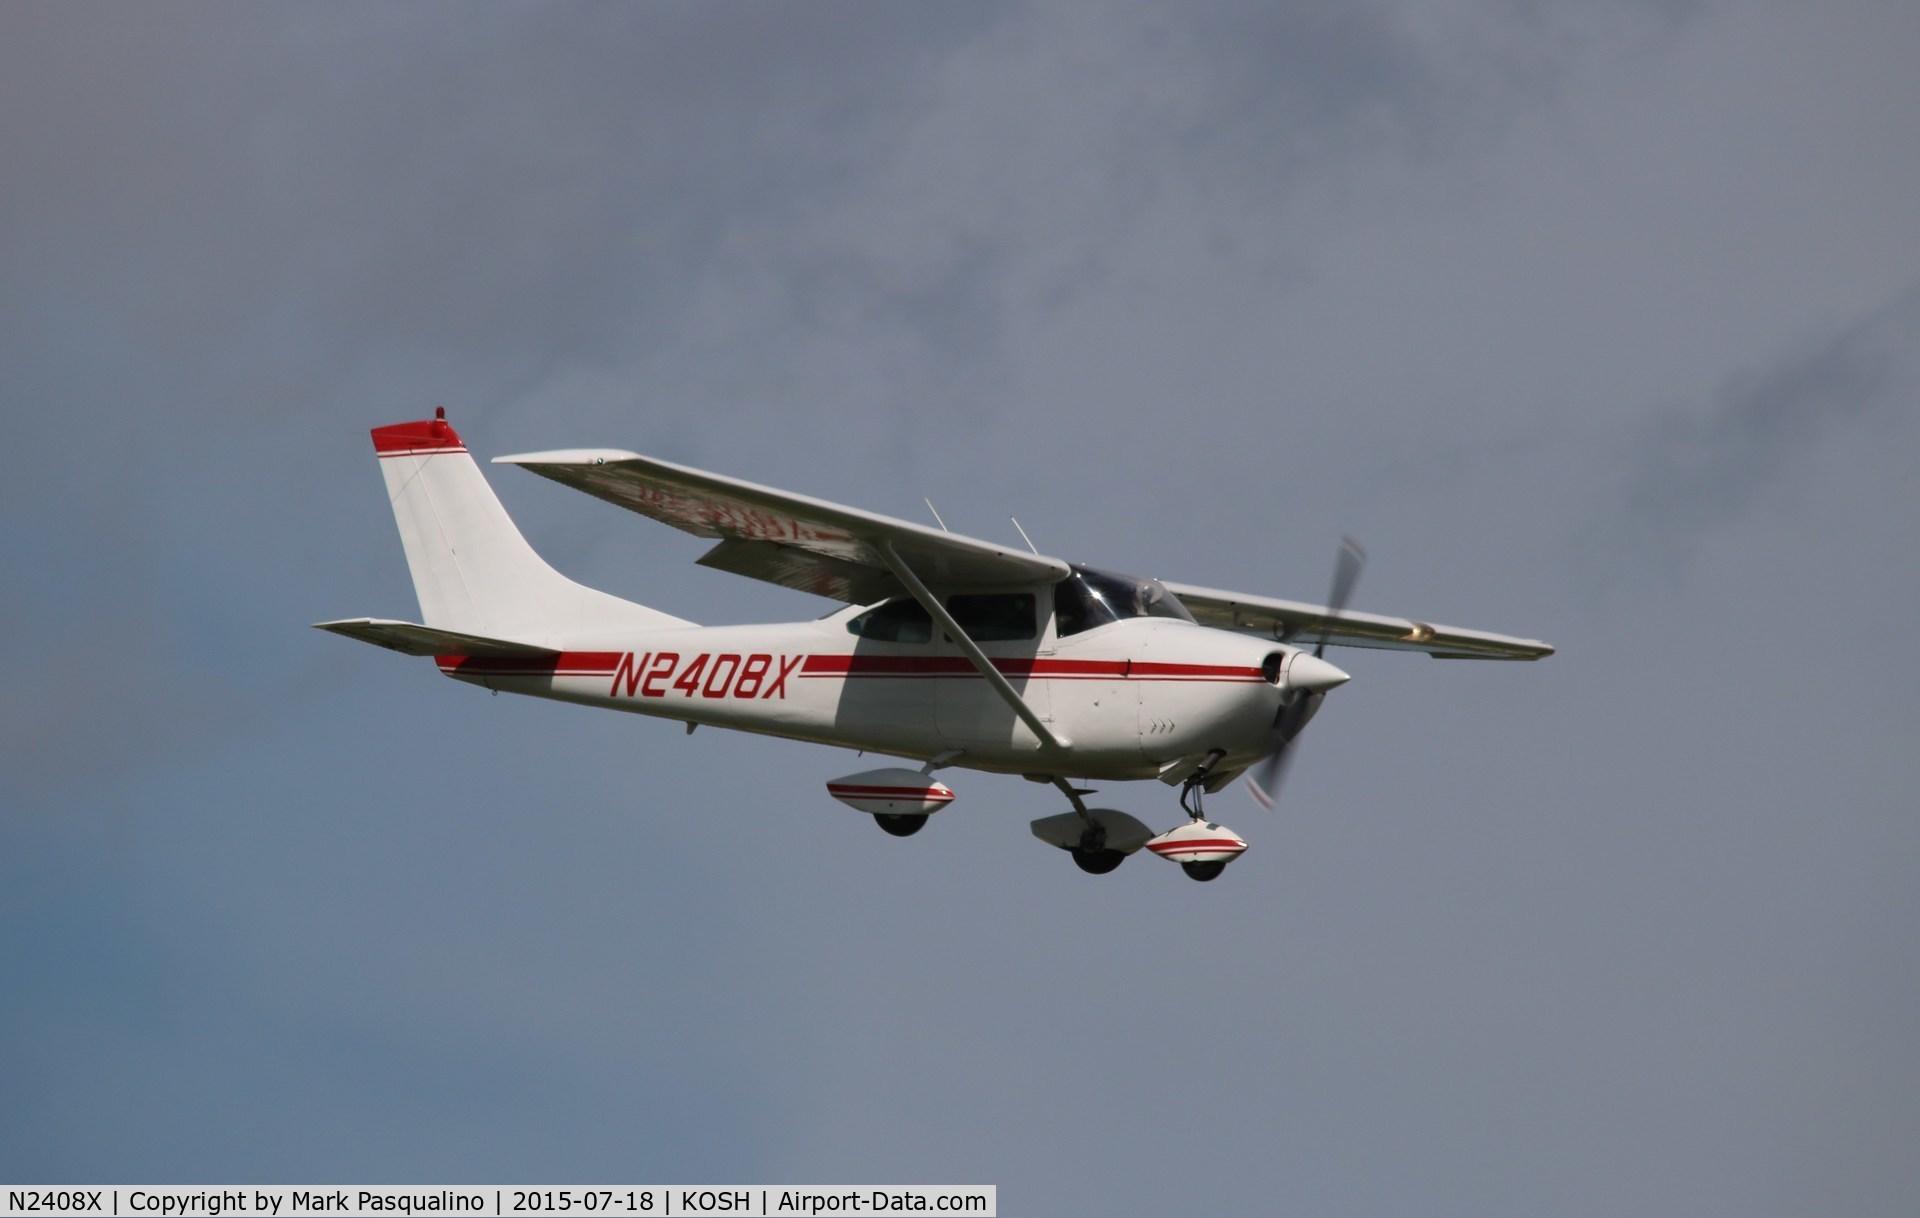 N2408X, 1965 Cessna 182H Skylane C/N 18256308, Cessna 182H